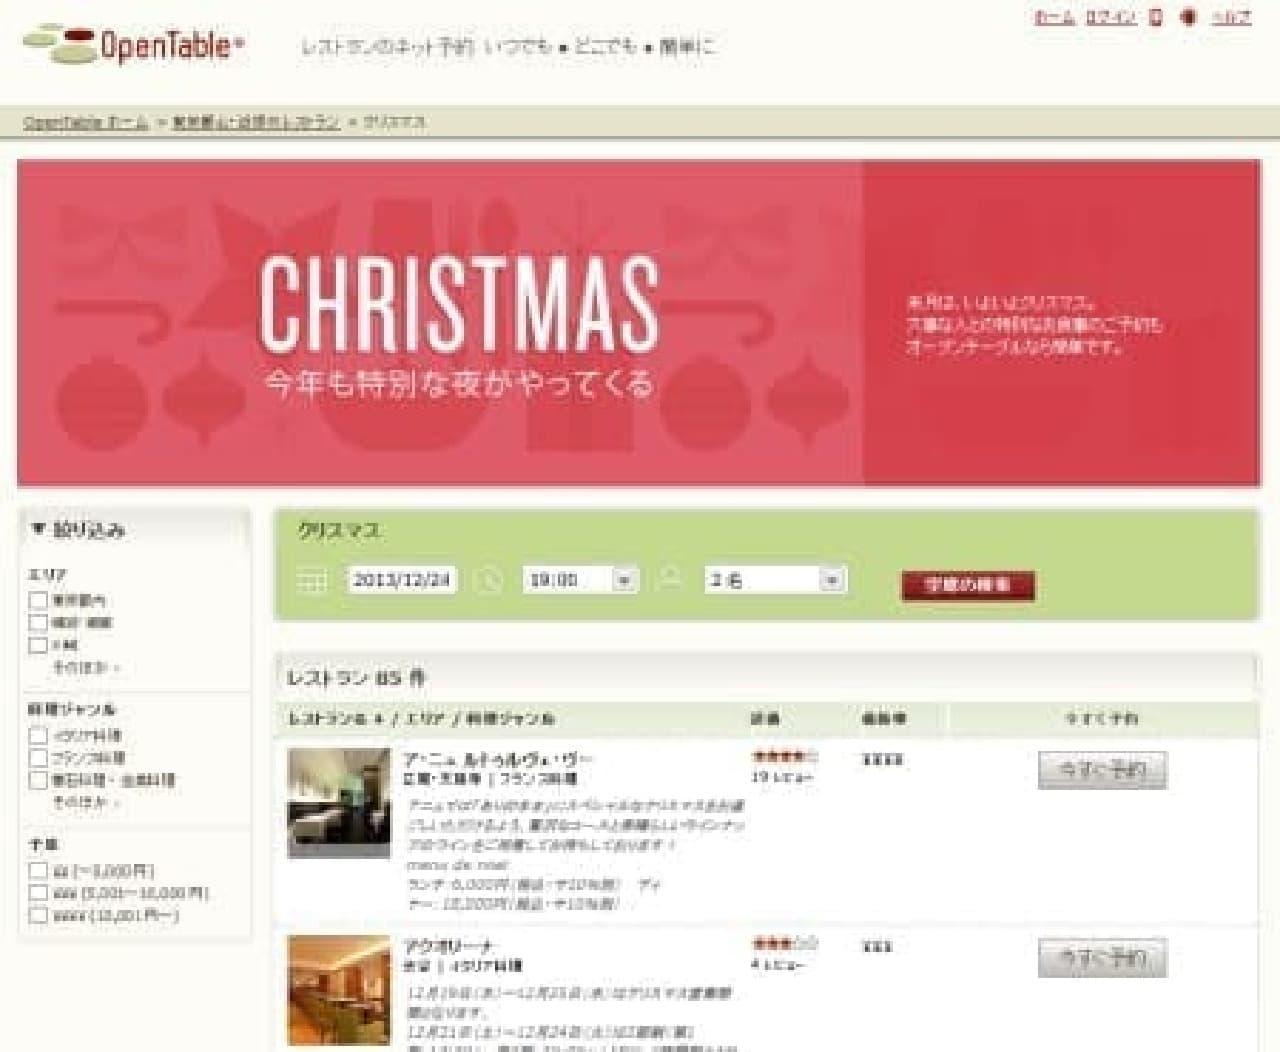 「OpenTable」クリスマスディナー特集ページ